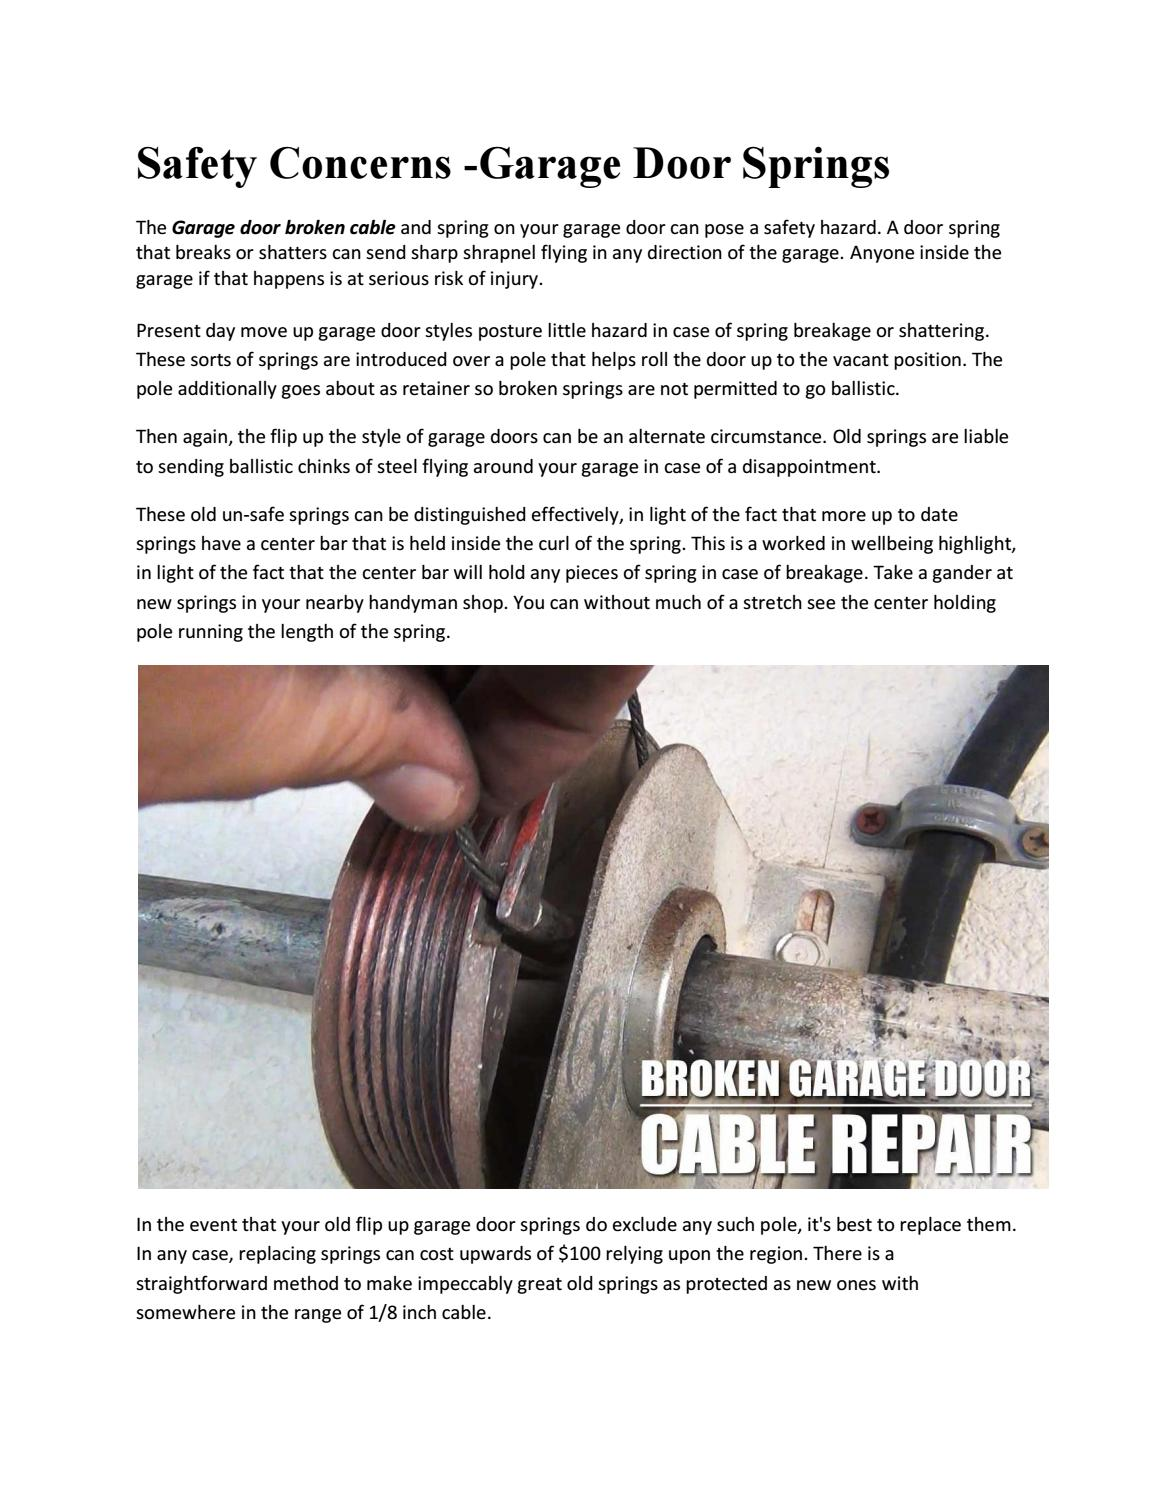 Safety Concerns Garage Door Springs By Alaxendar Bolt Issuu